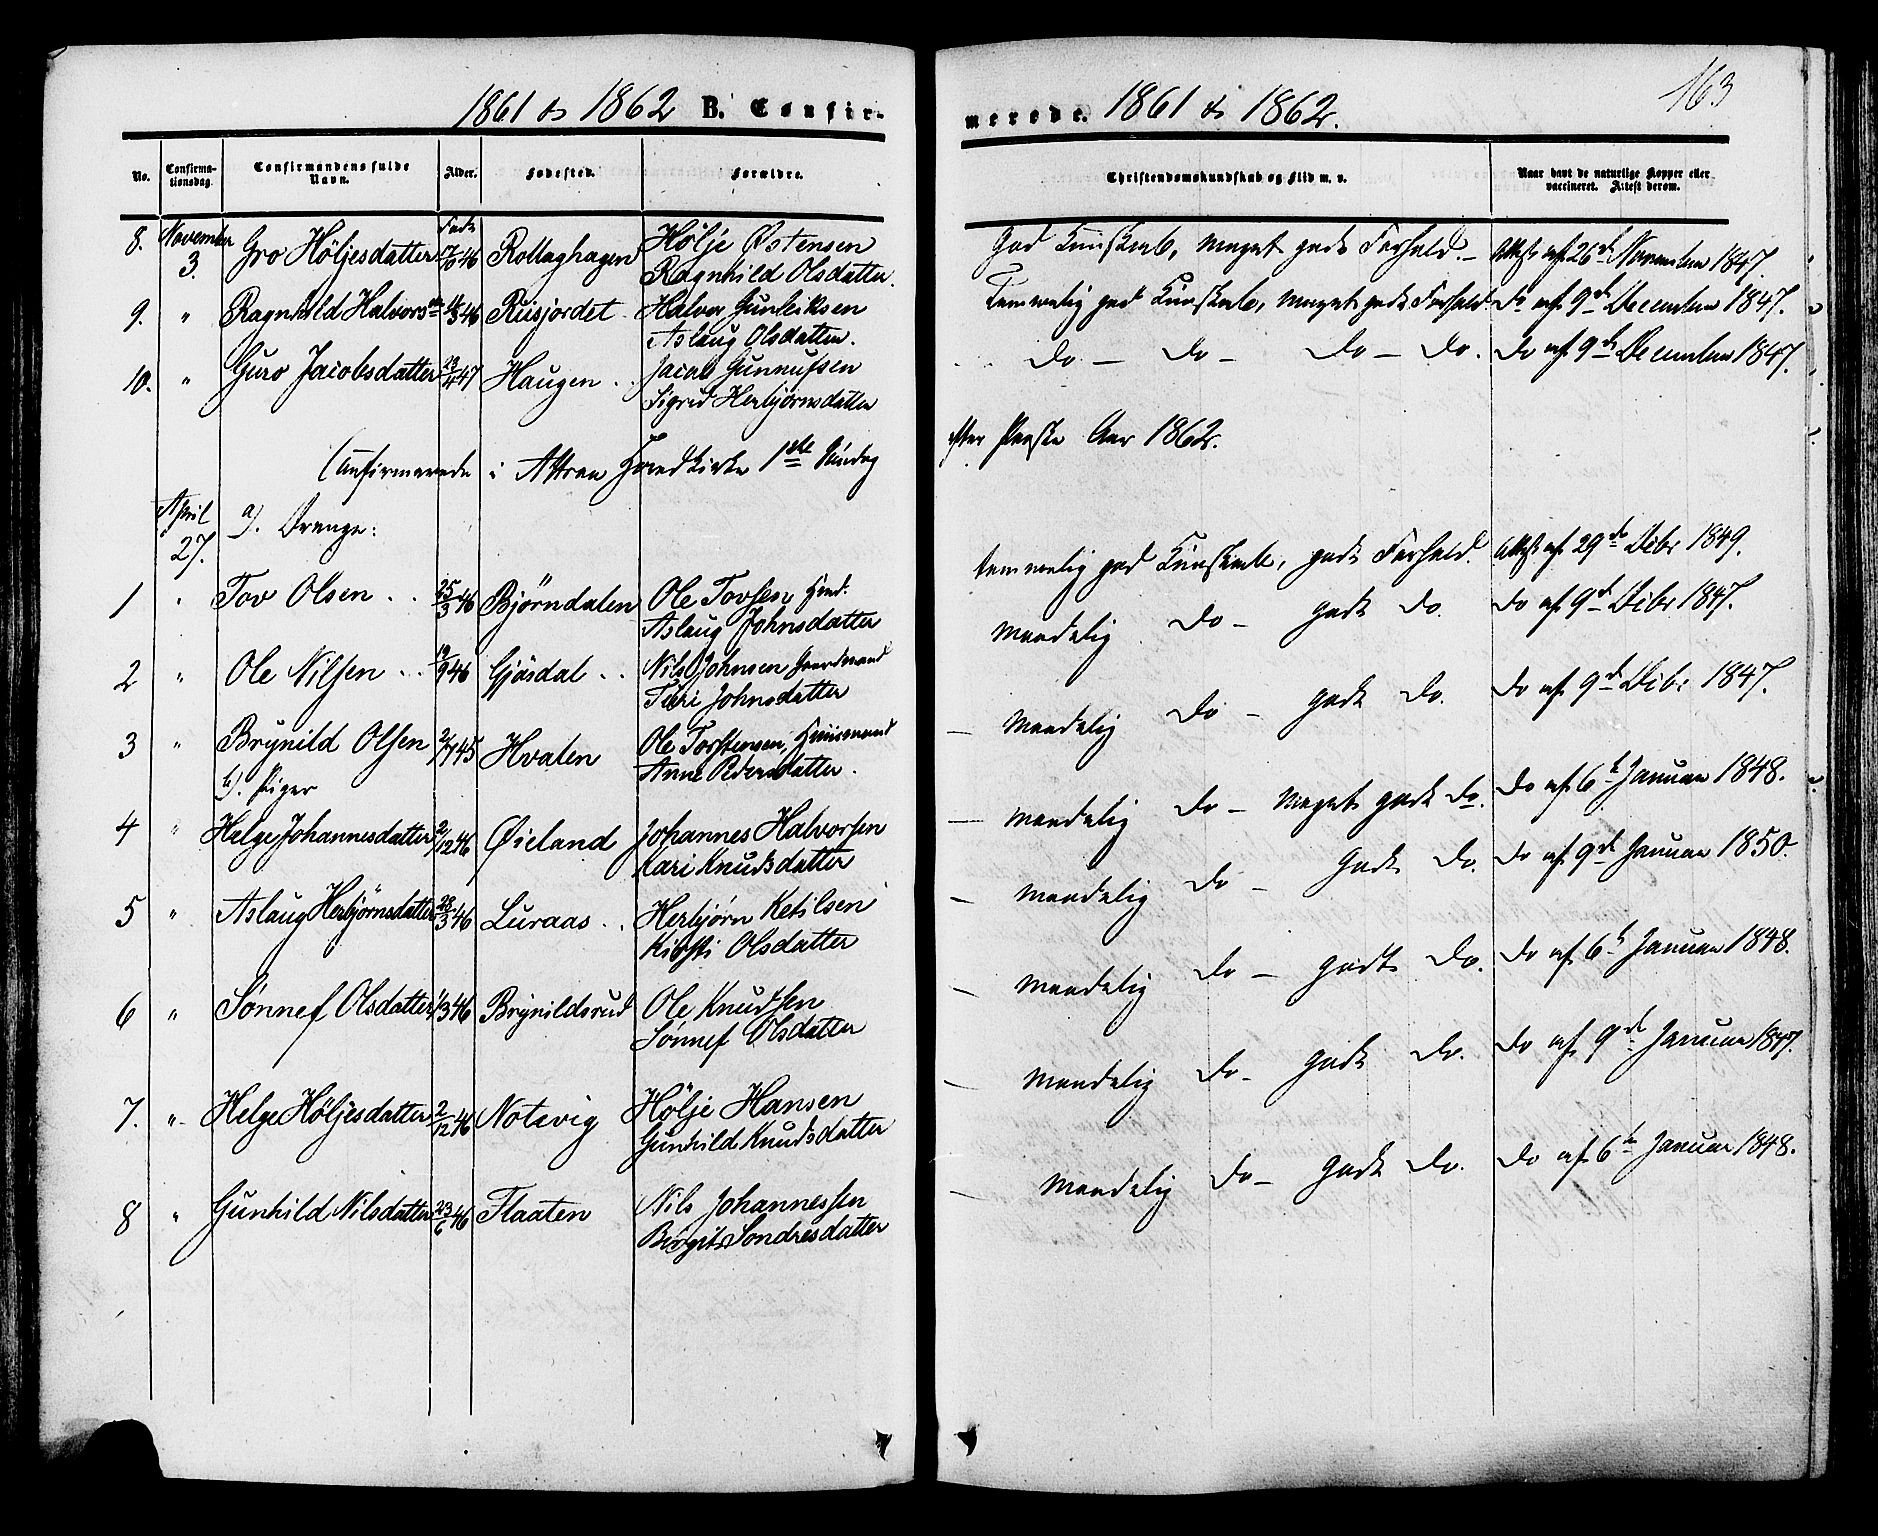 SAKO, Tinn kirkebøker, F/Fa/L0006: Ministerialbok nr. I 6, 1857-1878, s. 163